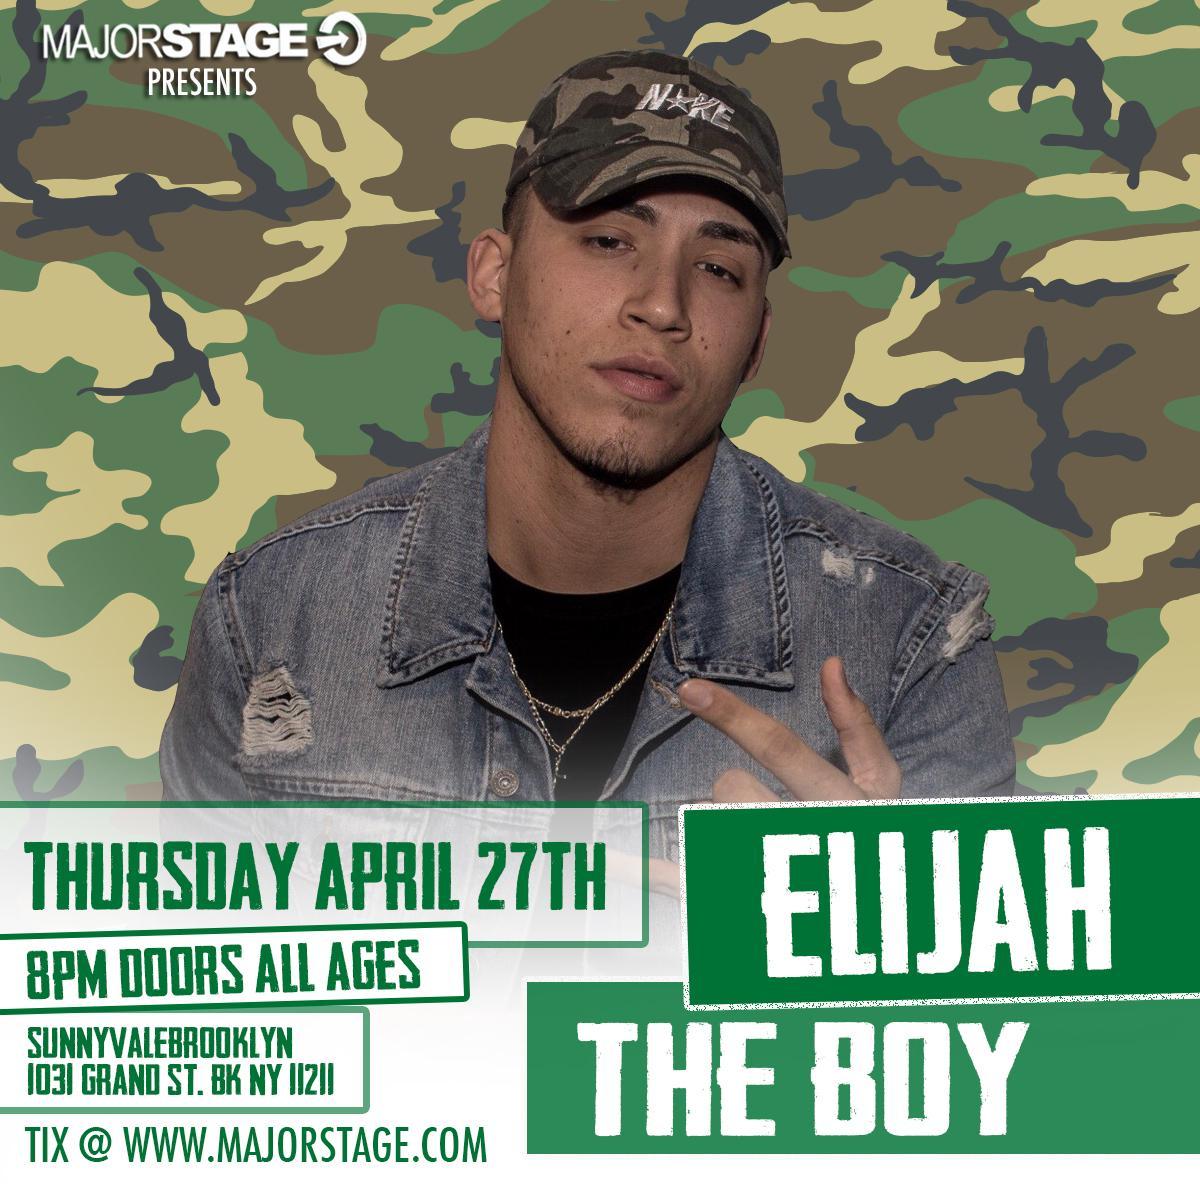 MajorStage presents Elijah The Boy Live in Br